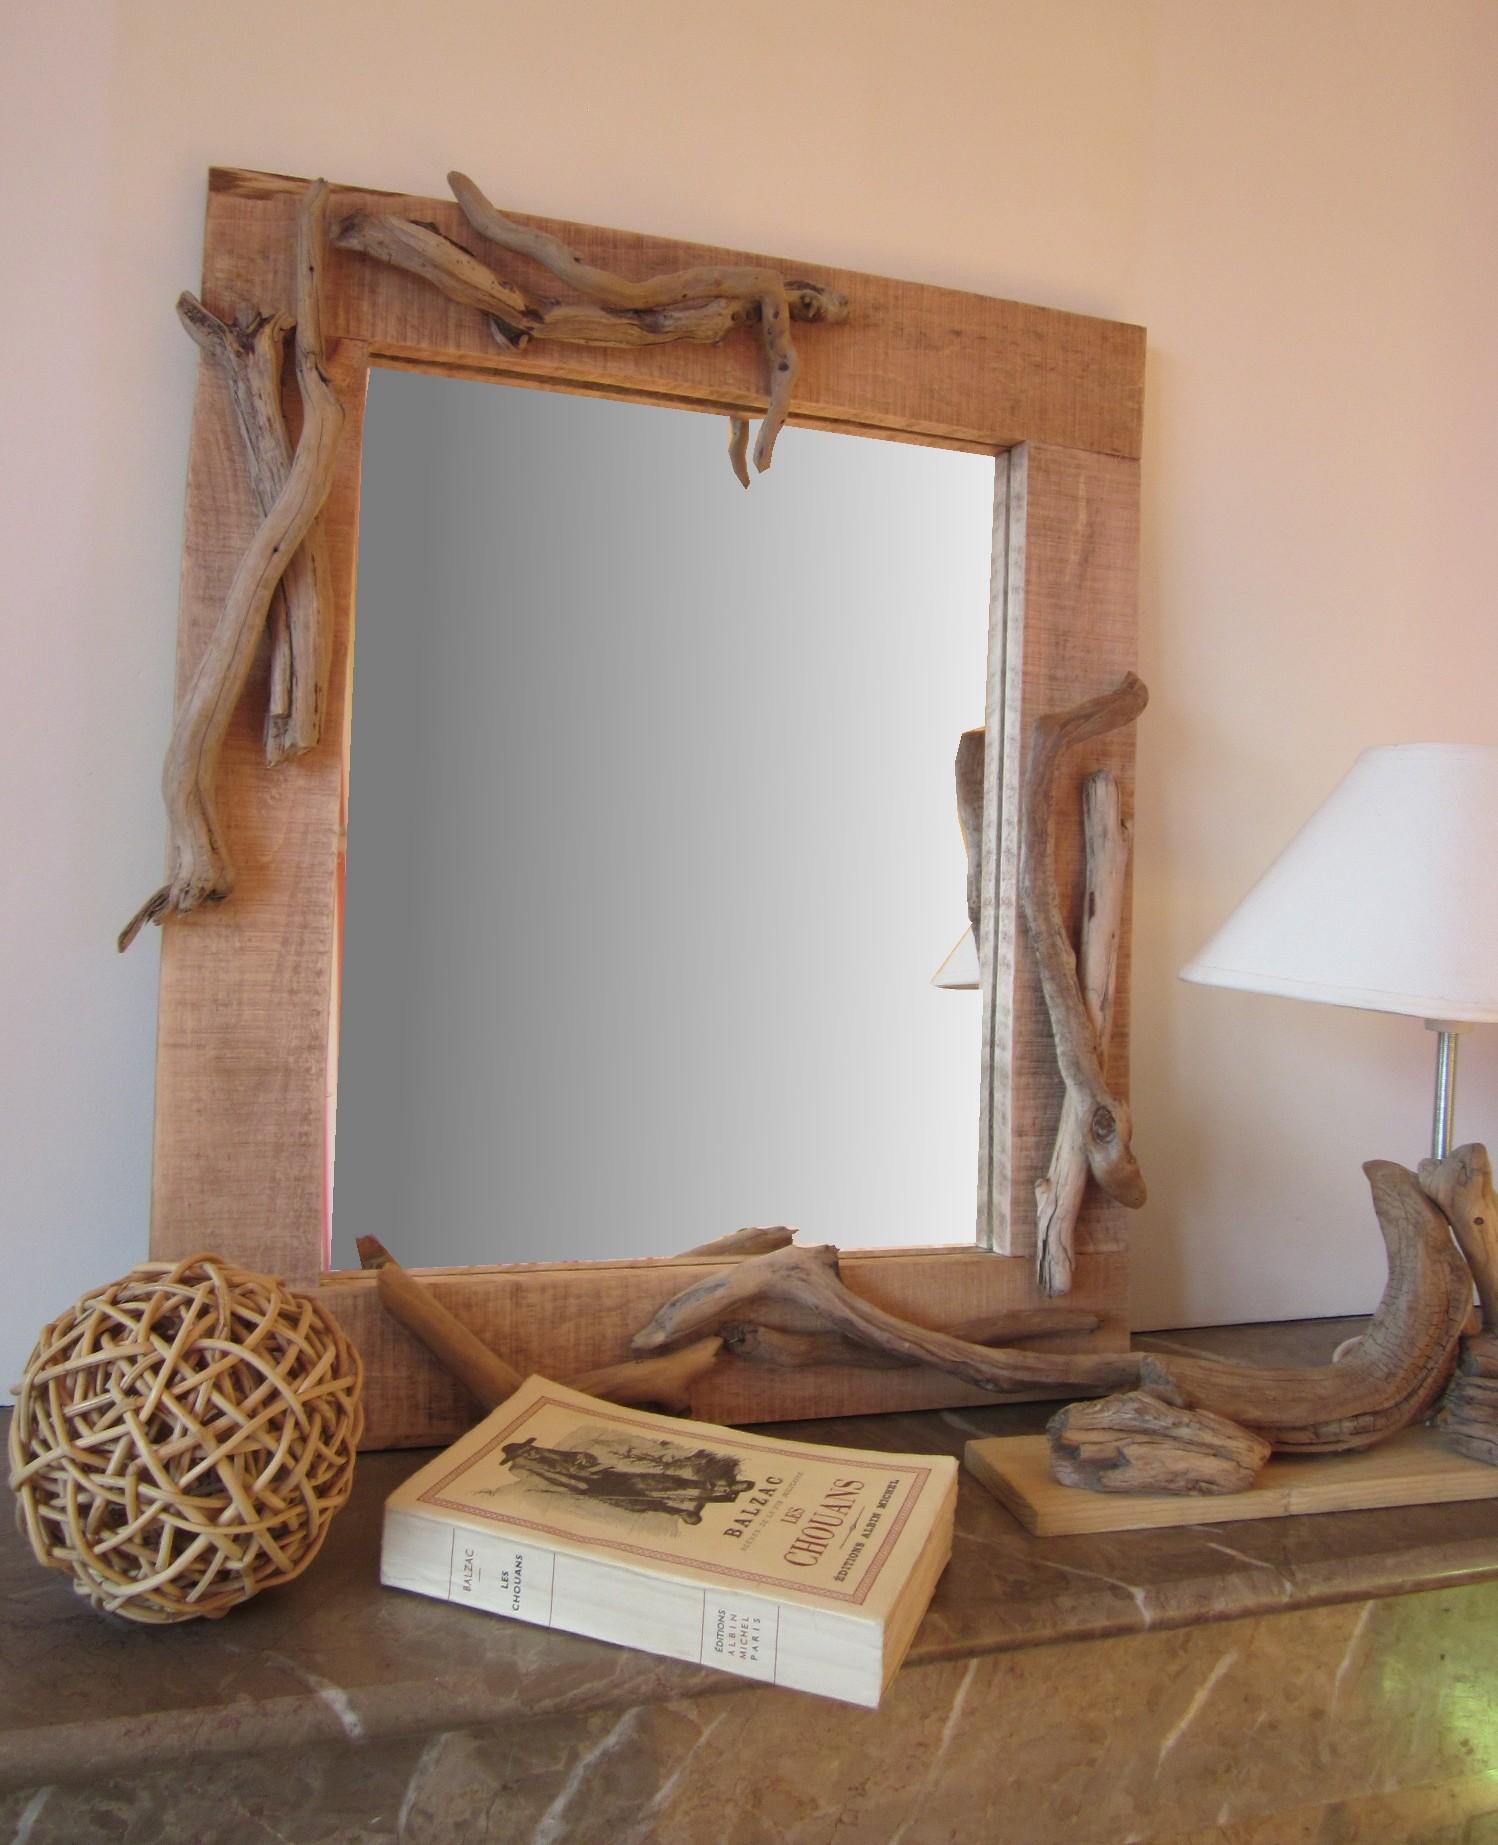 http://www.blog-decoration-miroir.fr/images/miroir-bois-flotte5.jpg